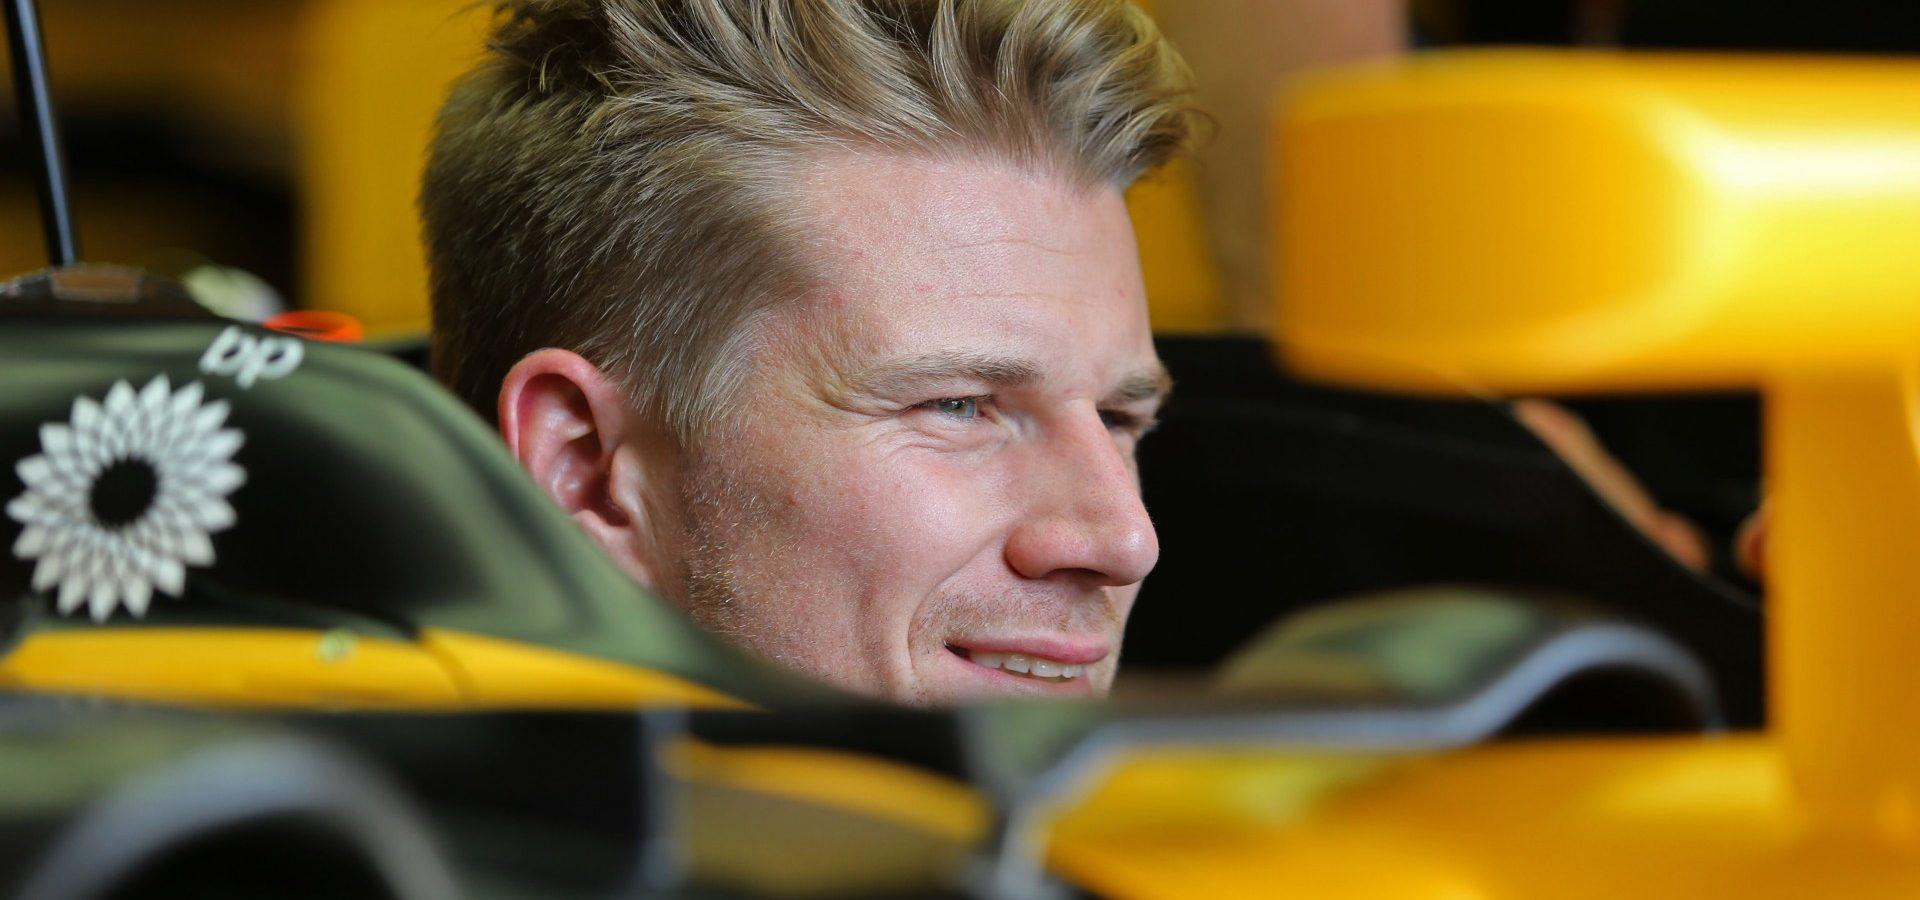 Motor Racing - Formula One World Championship - Canadian Grand Prix - Preparation Day - Montreal, Canada